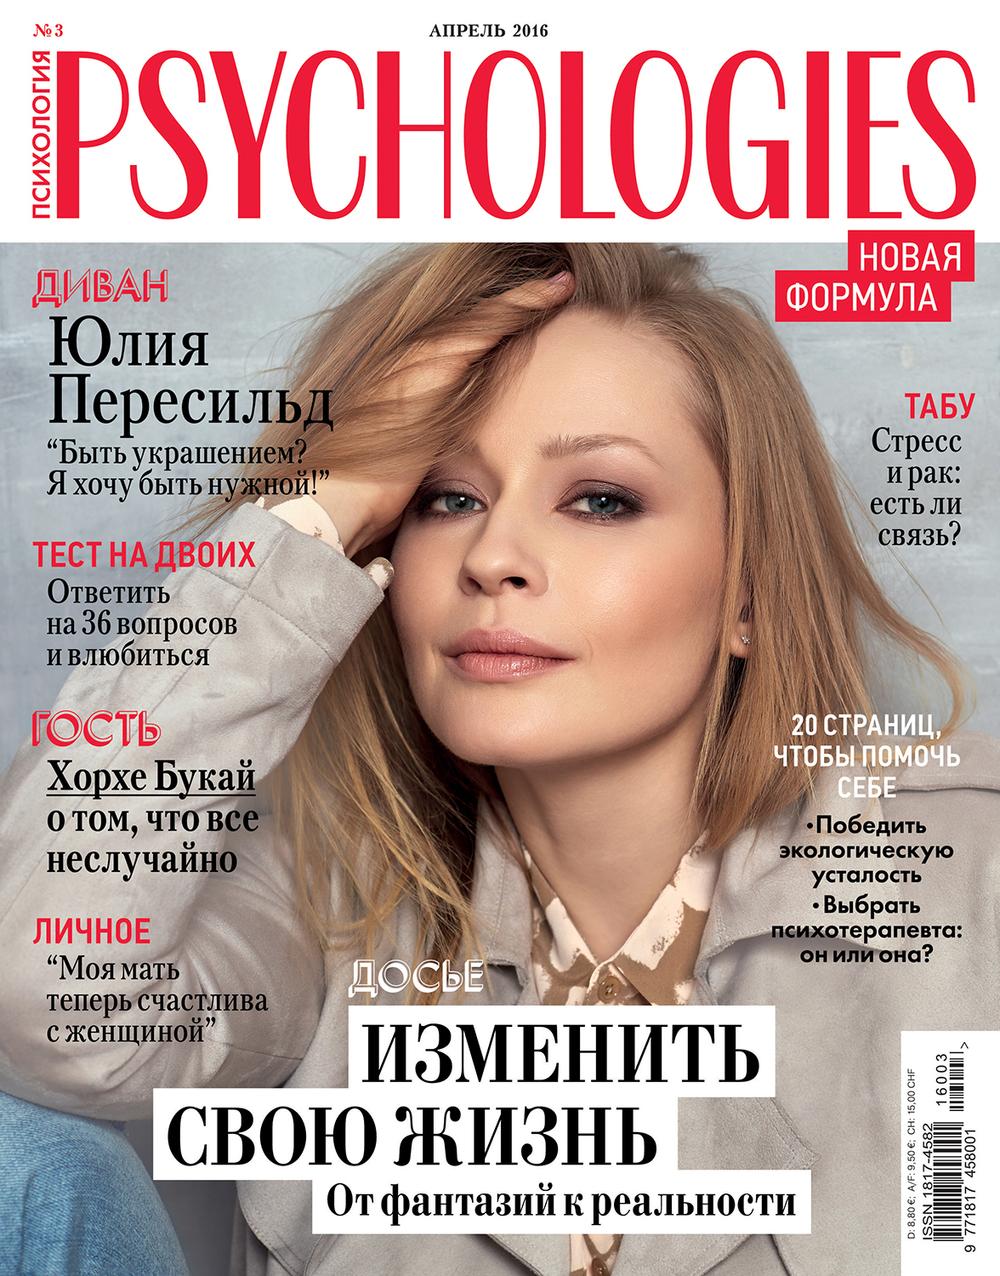 Yulia Peresild, Psychologies